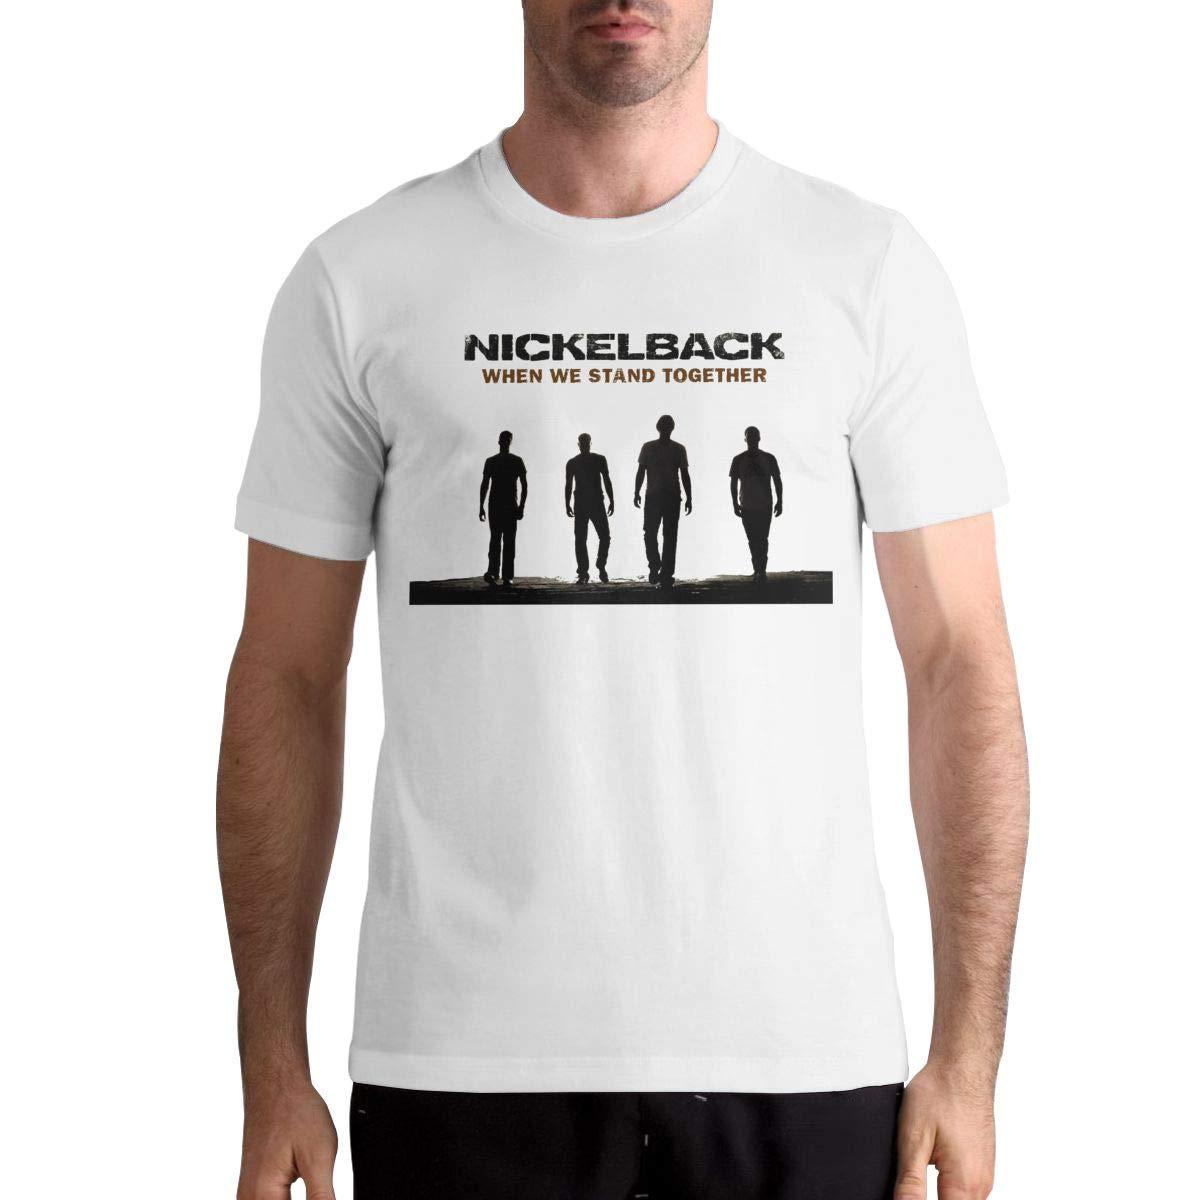 Nickelback Comfortable Short Sleeve T Shirts